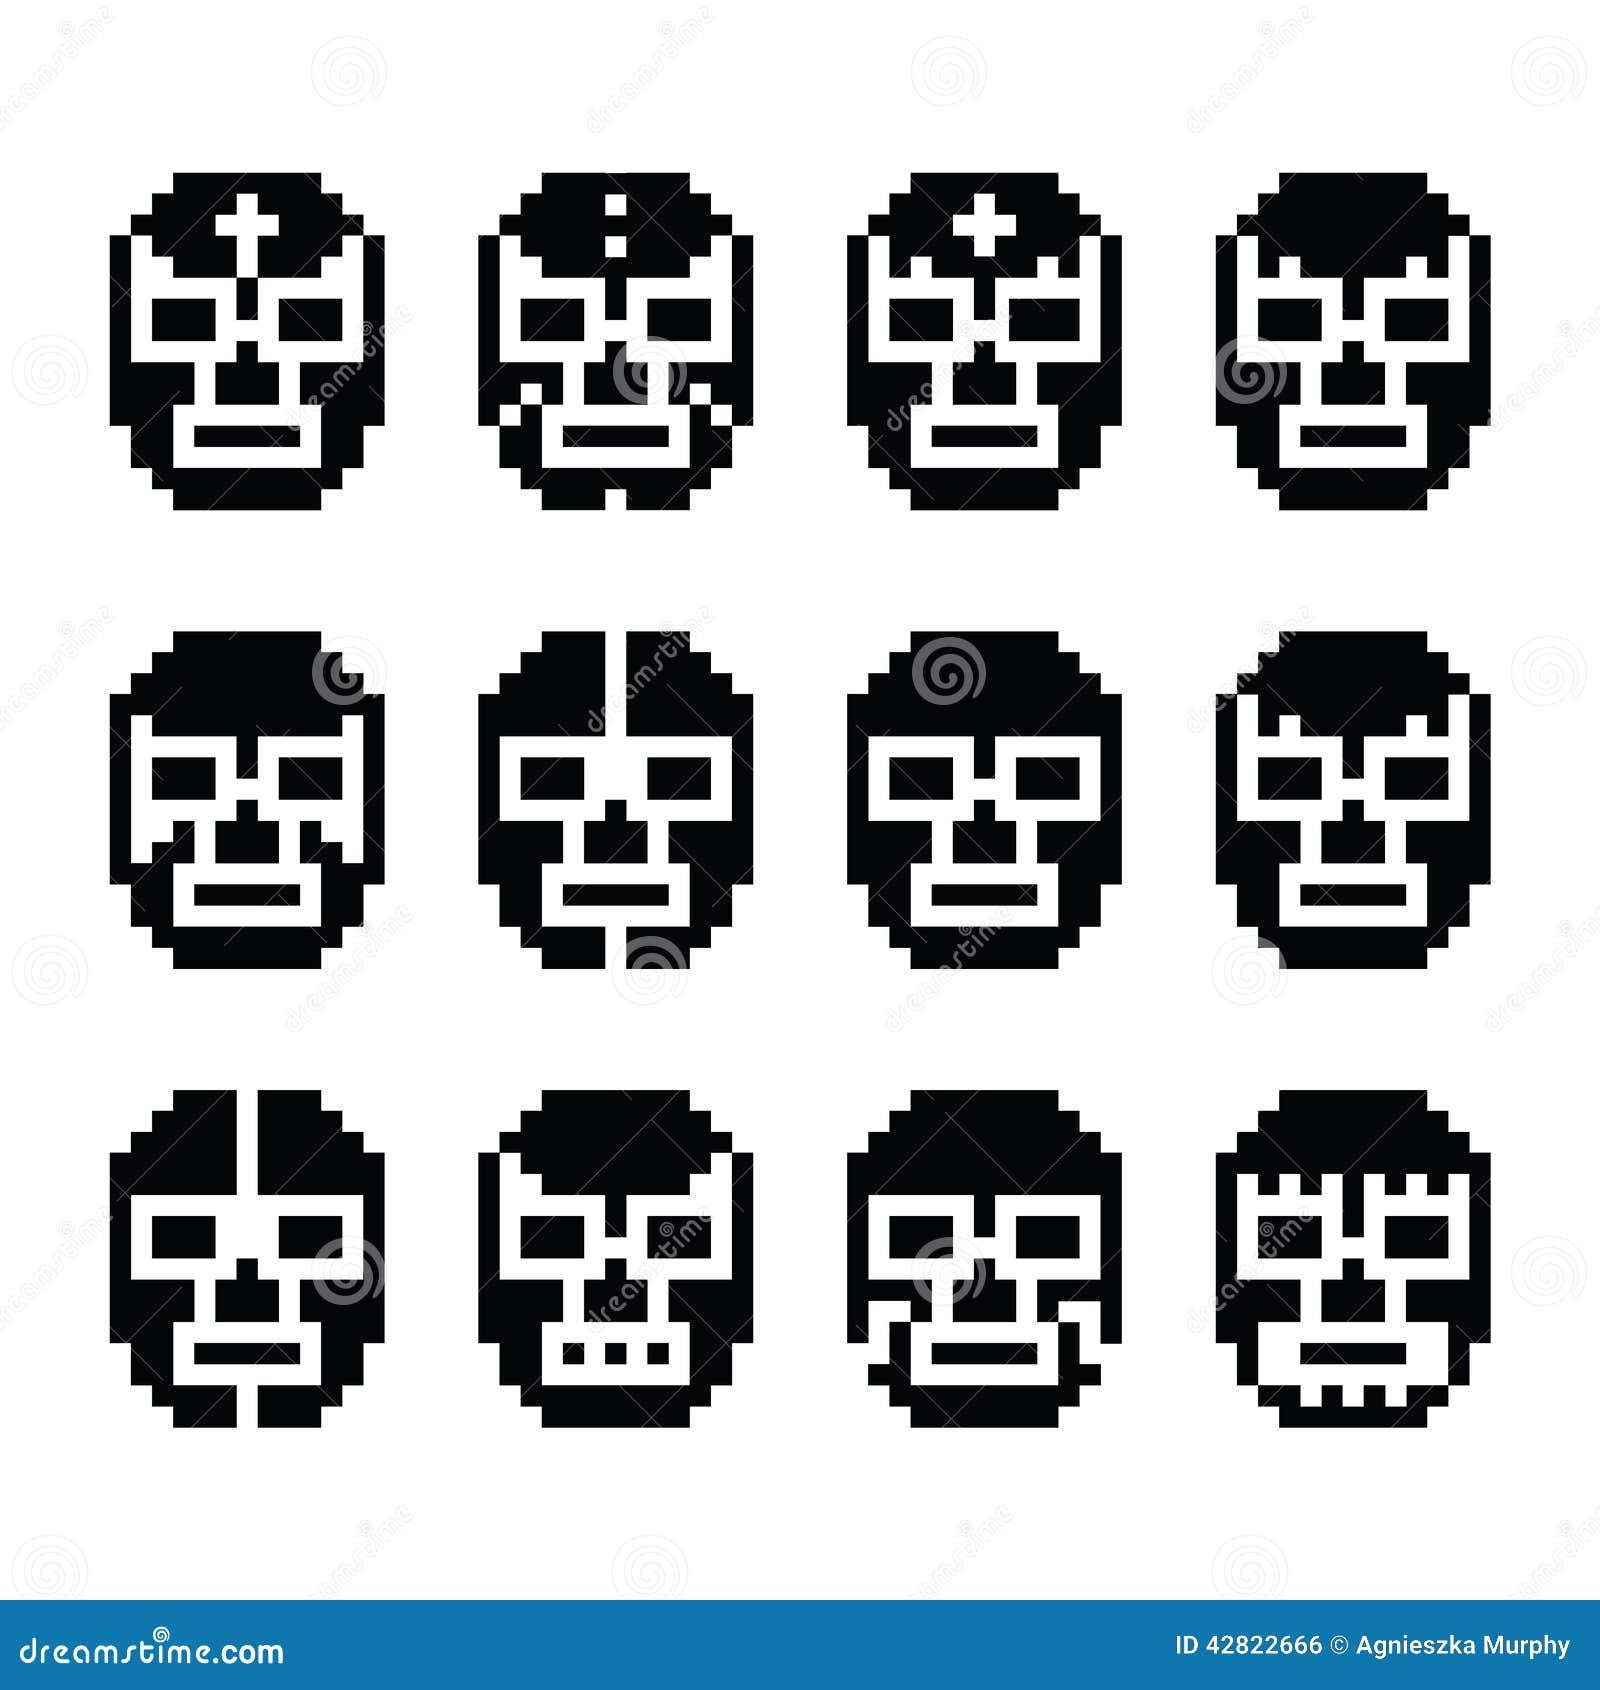 e6ac55635f5 Illustration: English Premier League 2014 - 2015 Football Or Soccer Jerseys  Icons Set